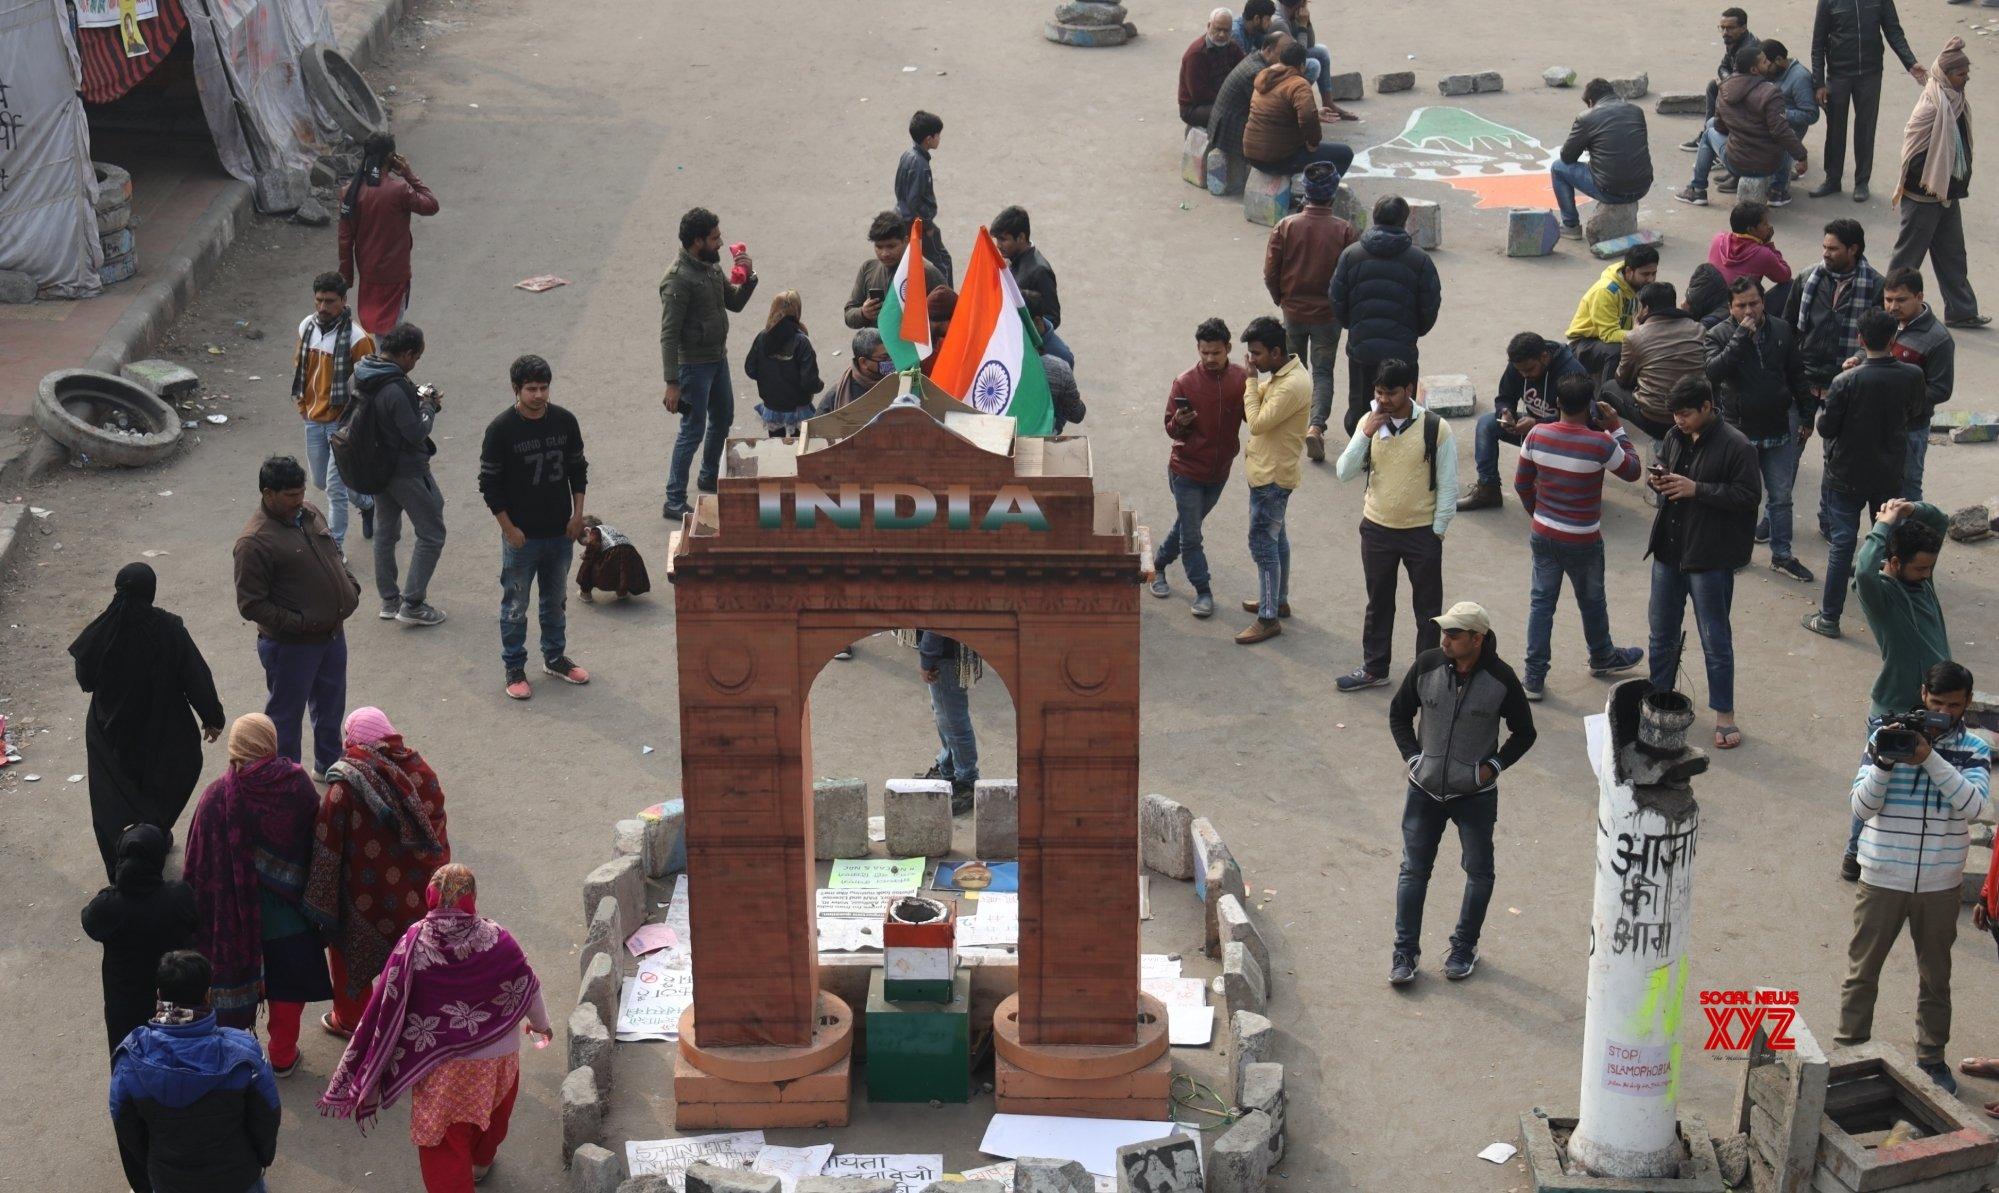 New Delhi: Protests against CAA - NRC - NPR #Gallery